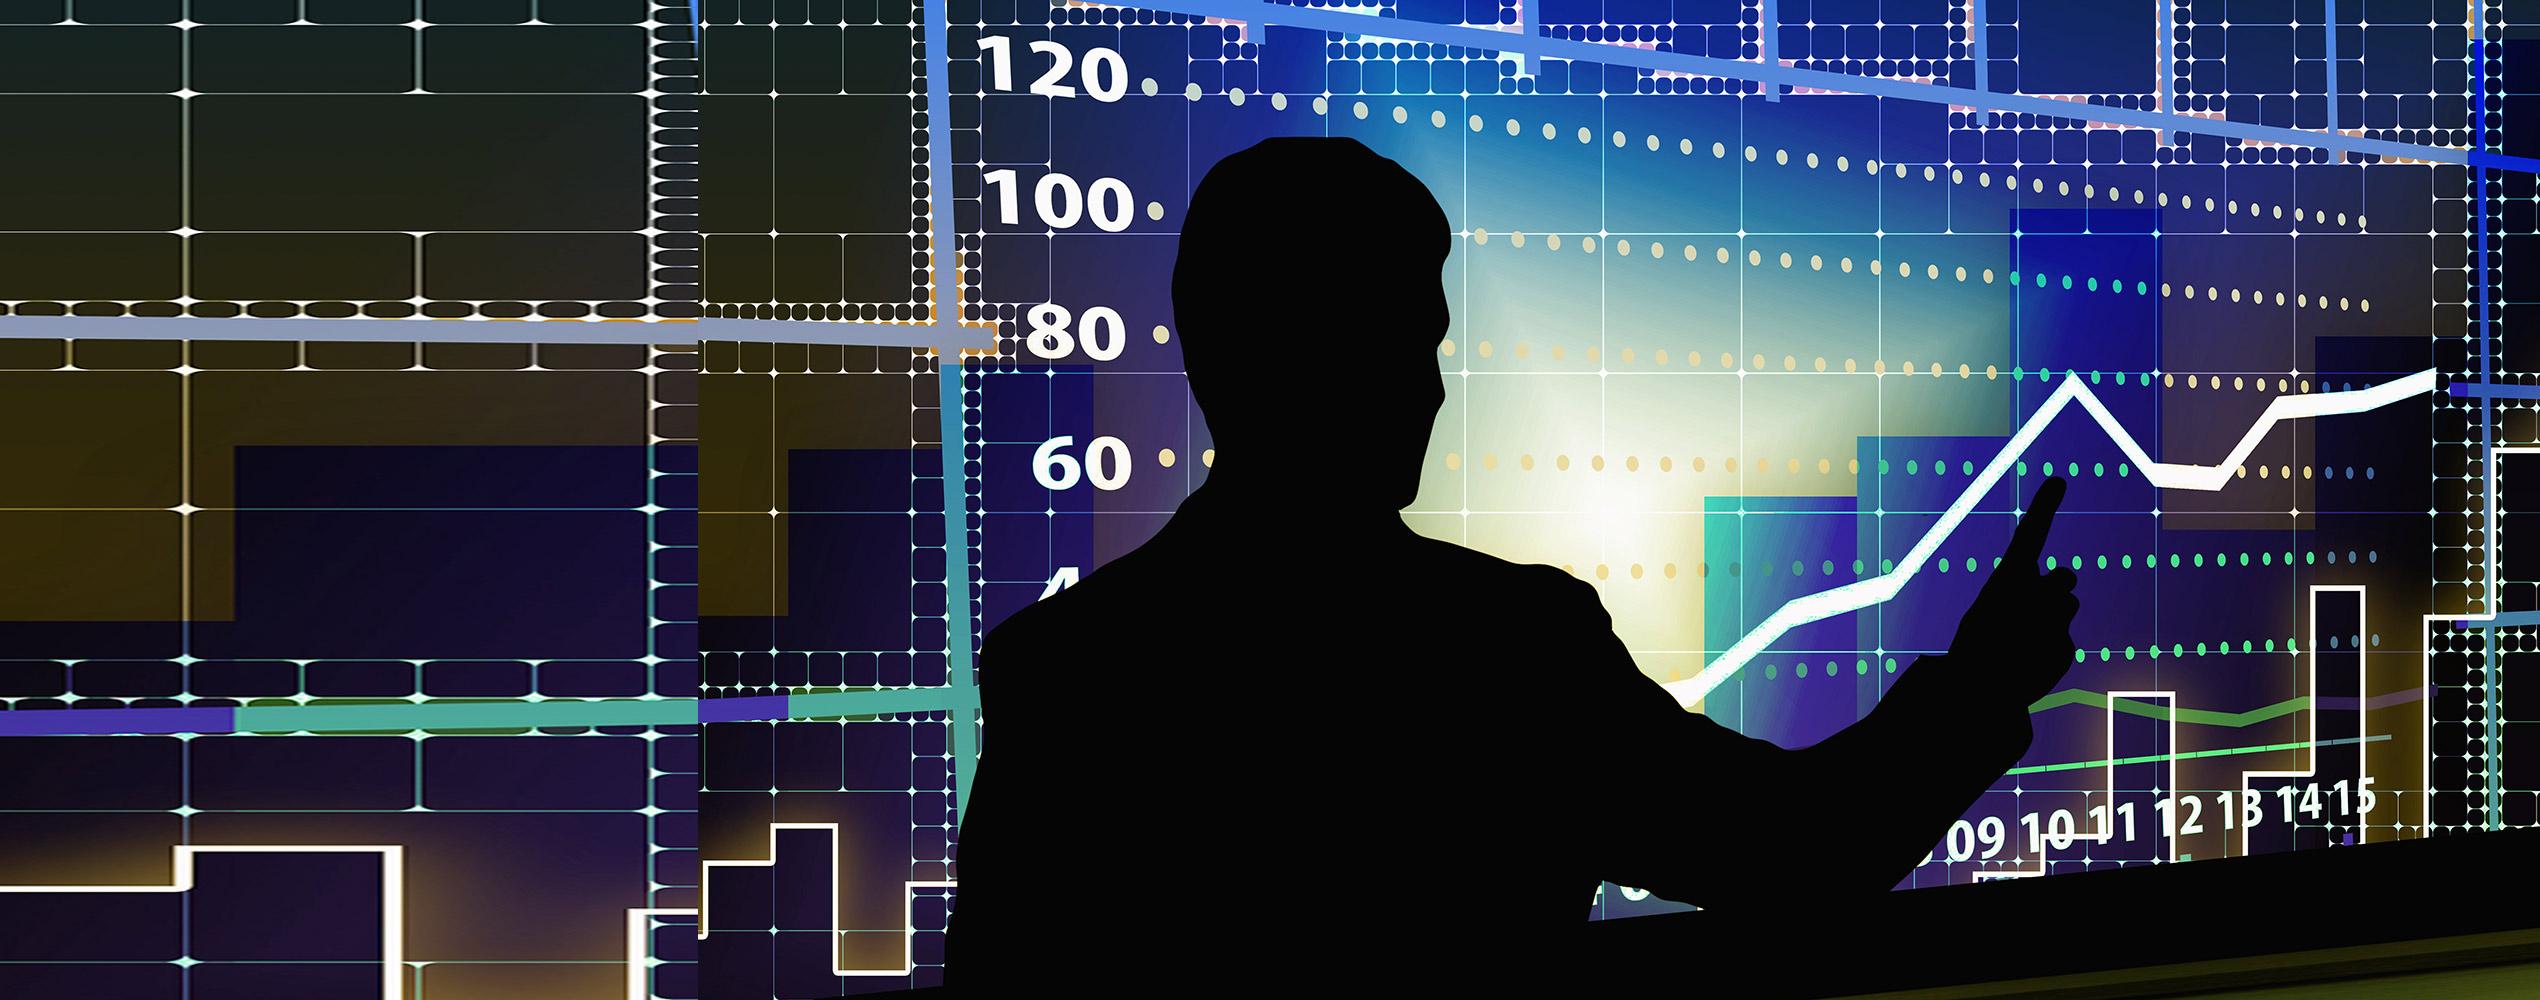 pixabay-geralt-world-economy-3513561-2540x1000-HEADER